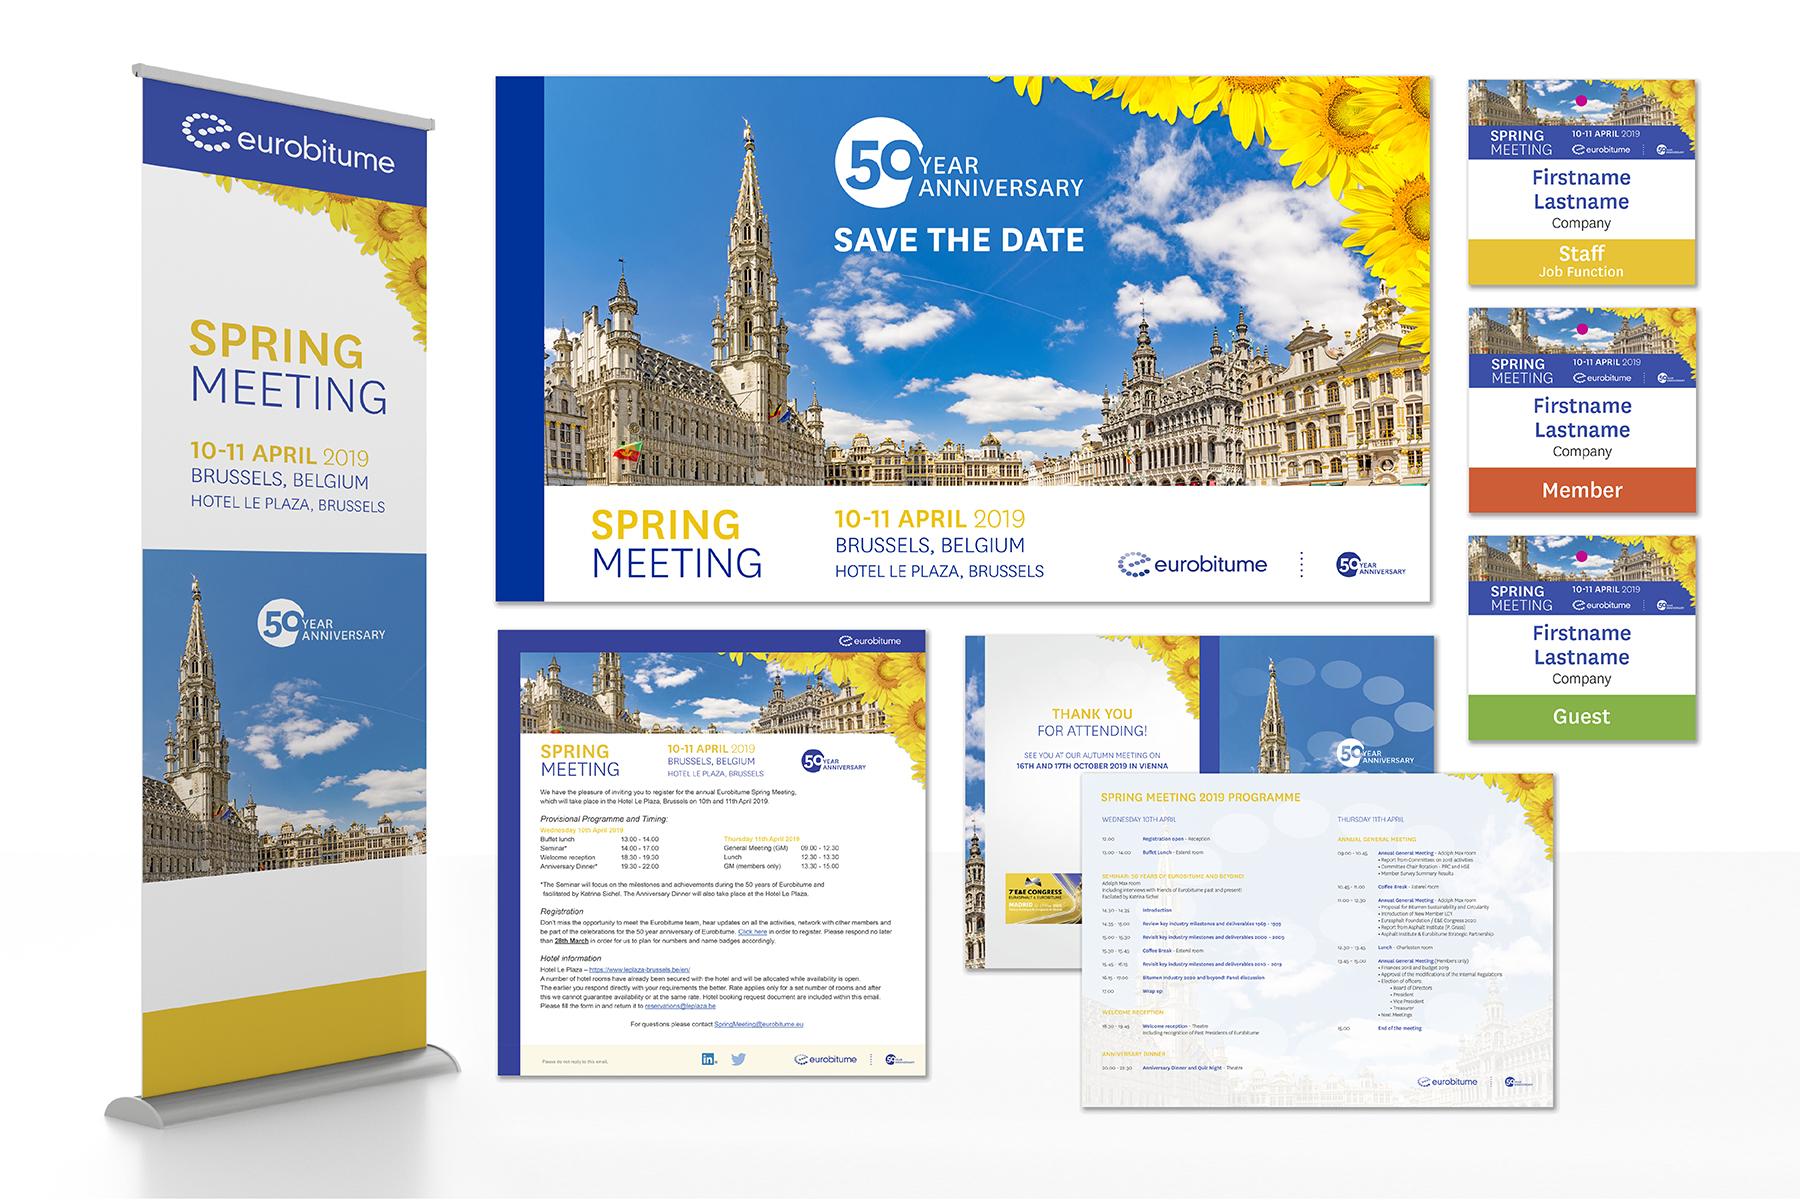 Centigrade - Eurobitume Spring Meeting